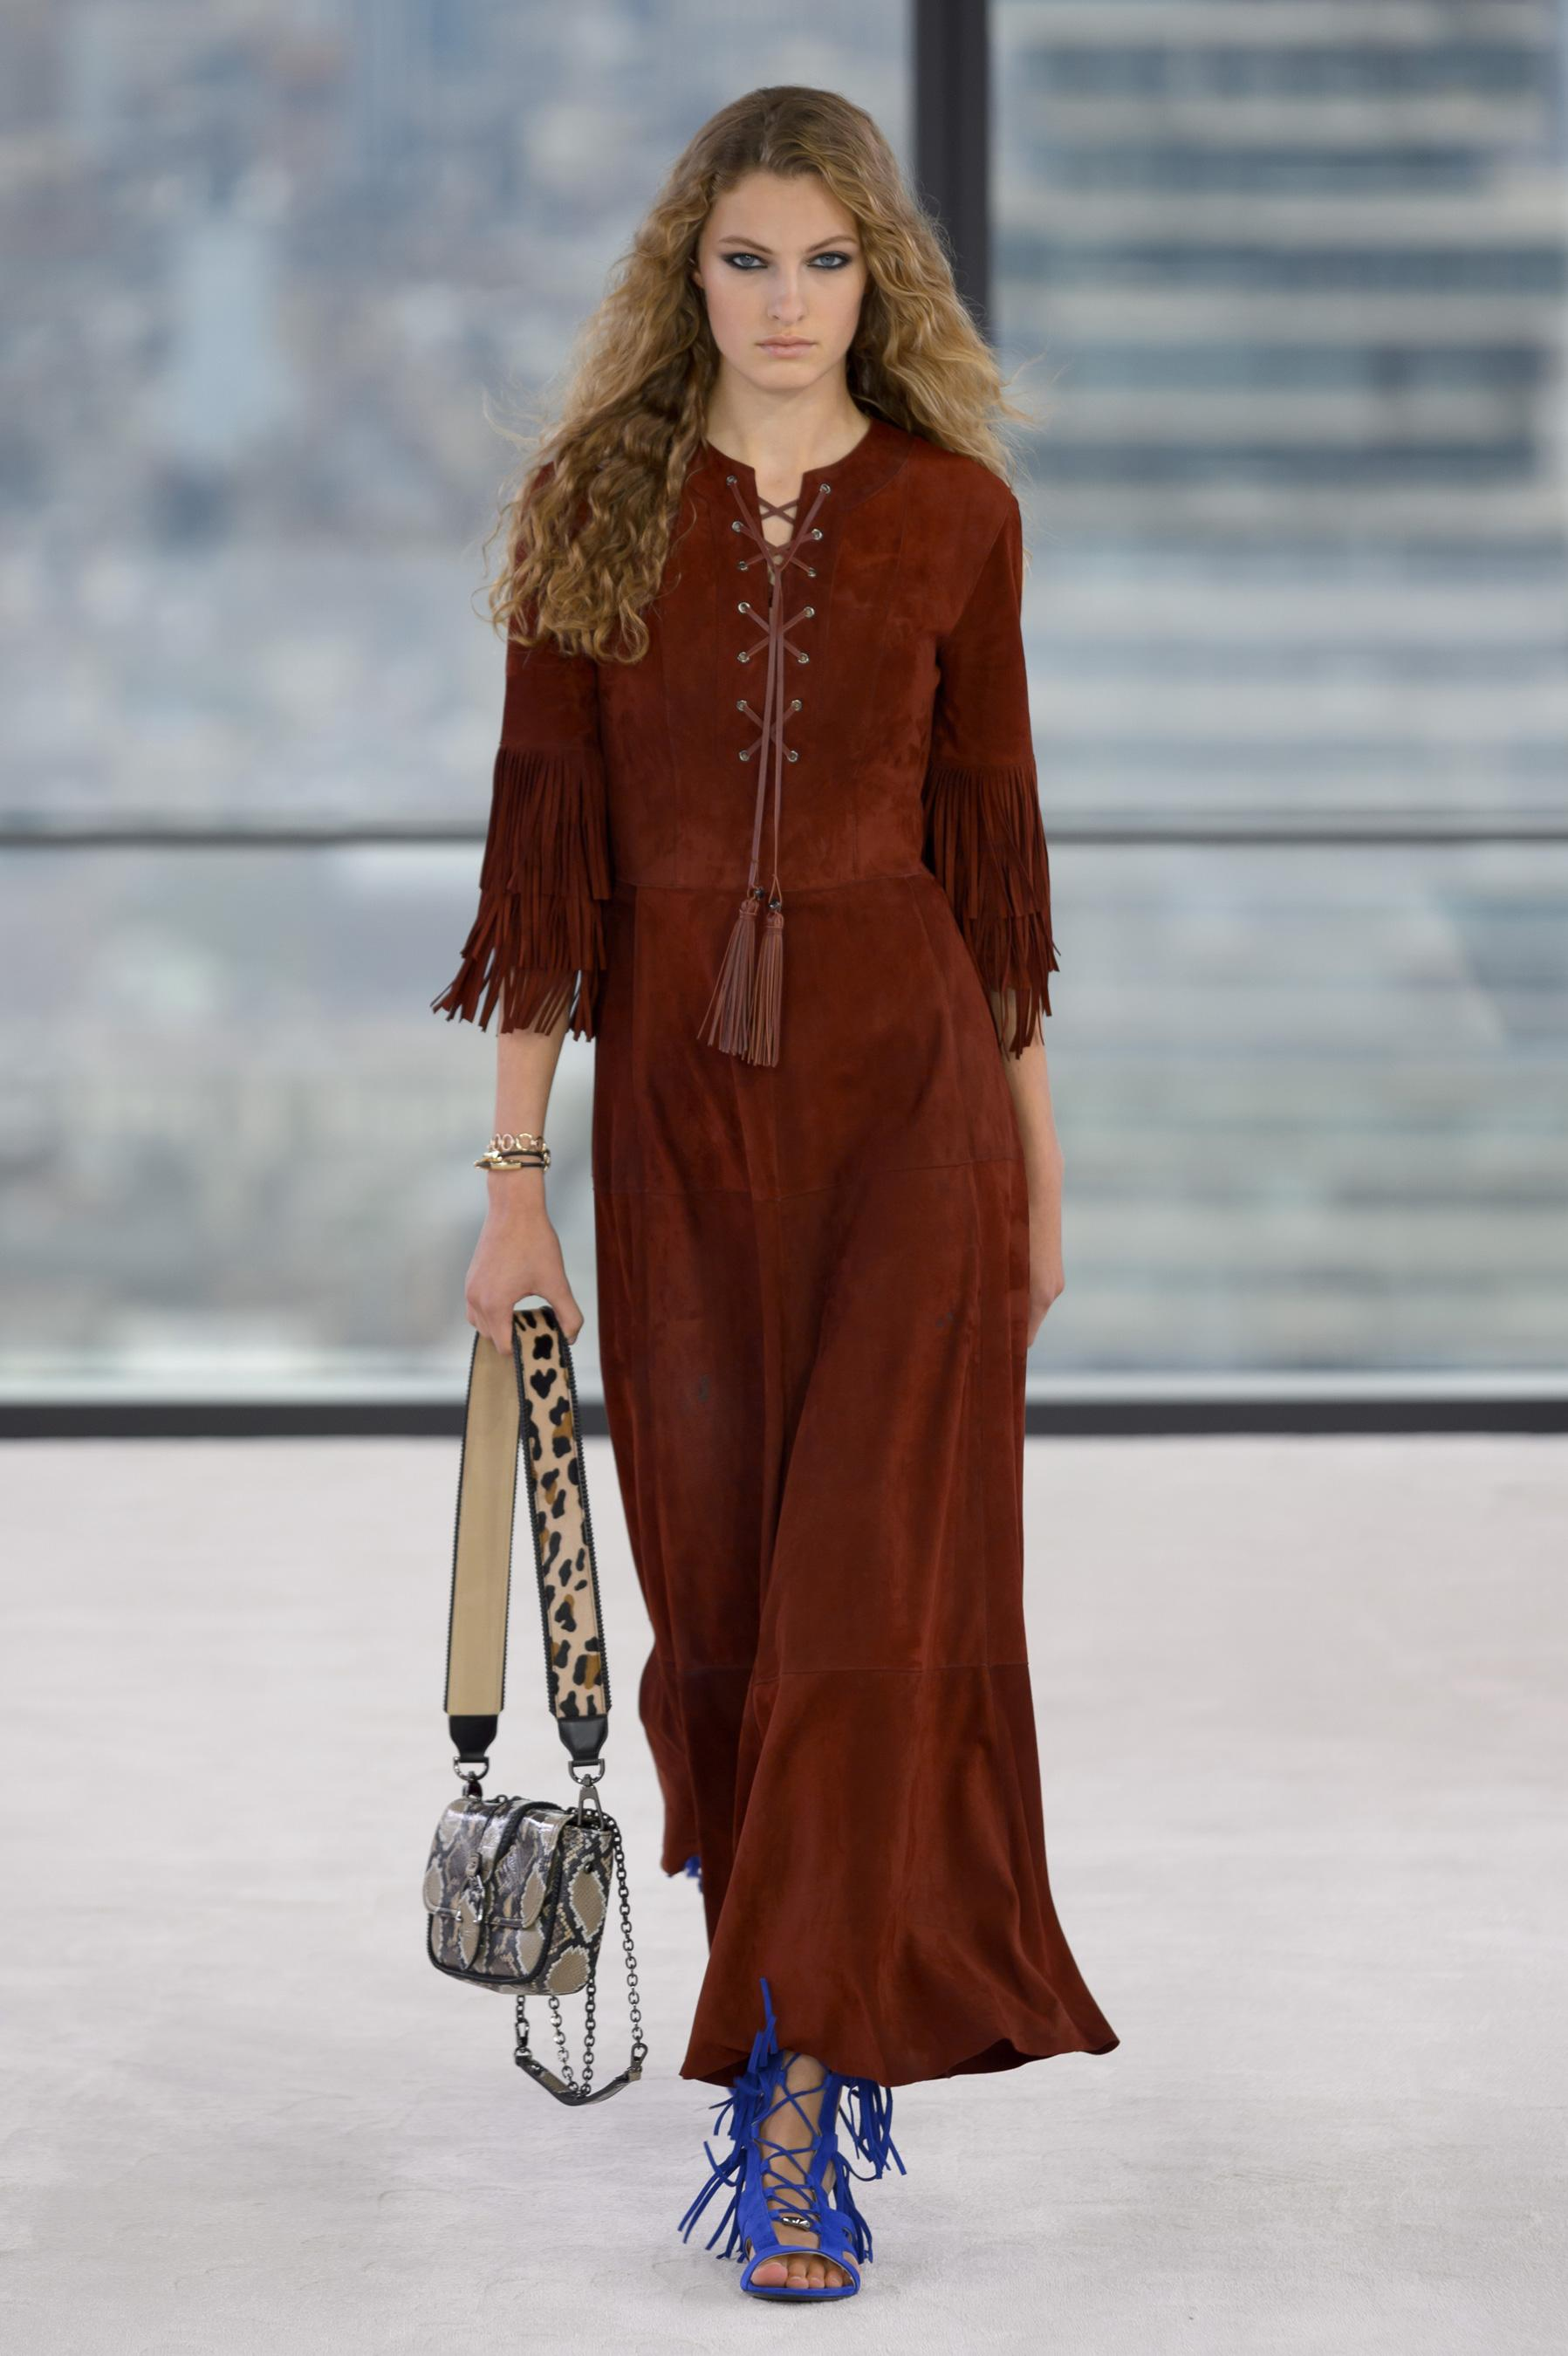 Printemps Été New York Défilé 36 Look Longchamp 2019 5fSnwnzq